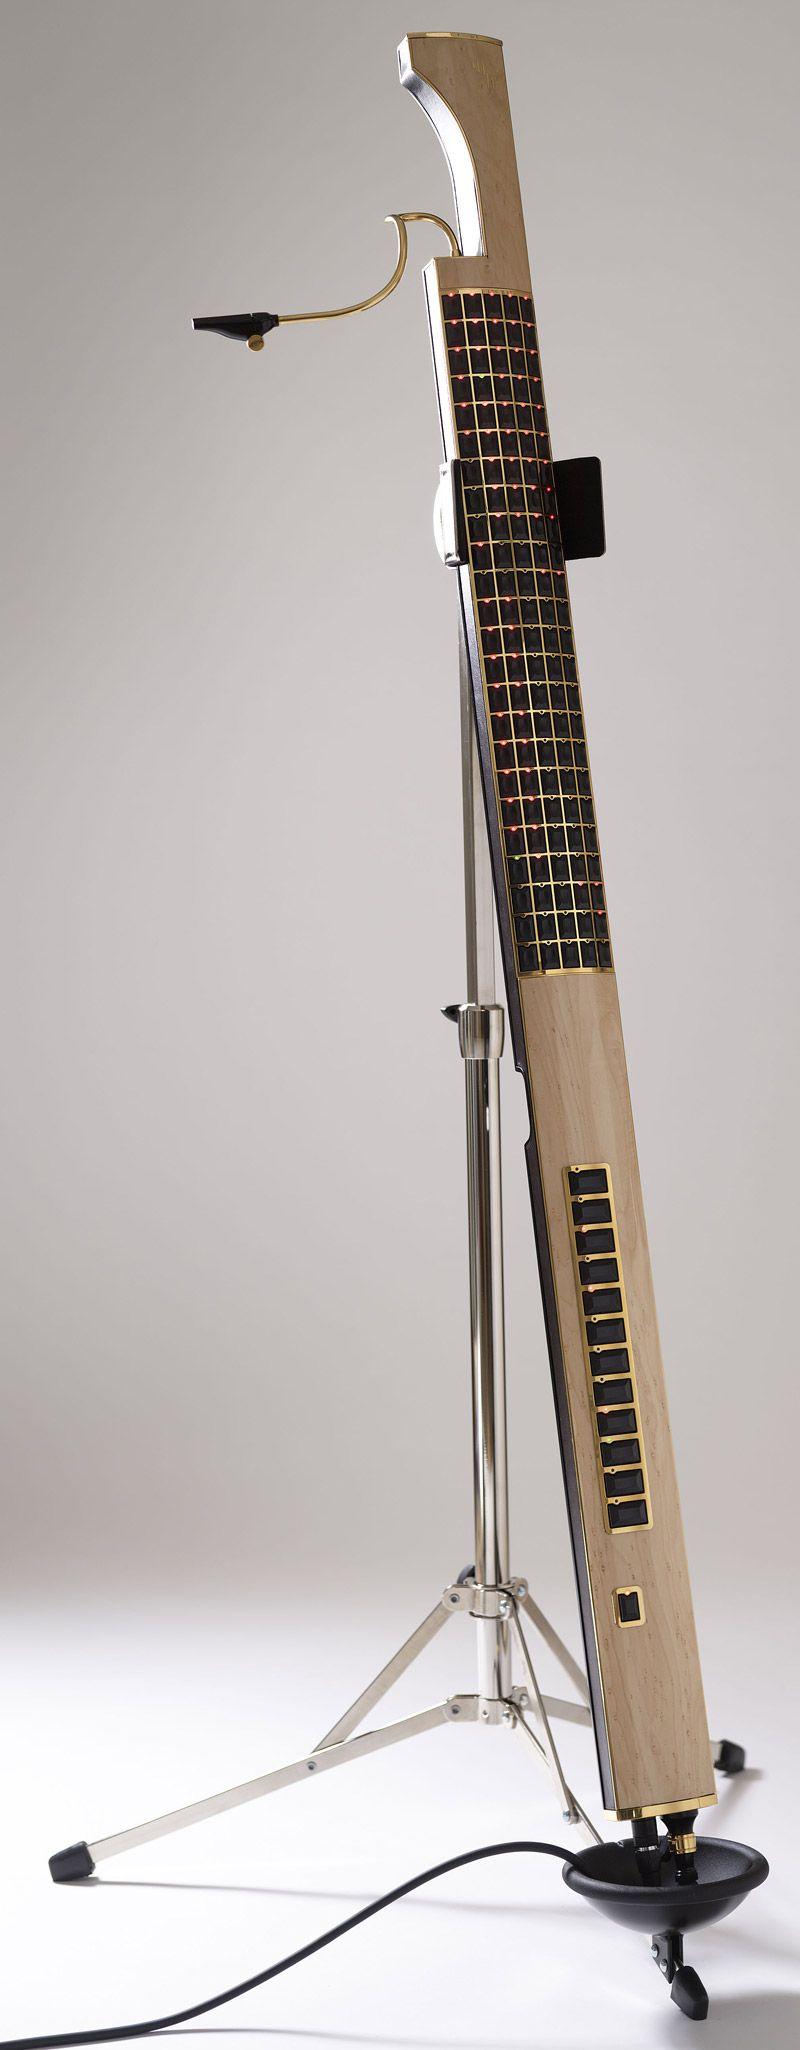 The Eigenharp. A sleek and beautiful musical instrument with astonishing performance capabilities.   WeImprovise.net